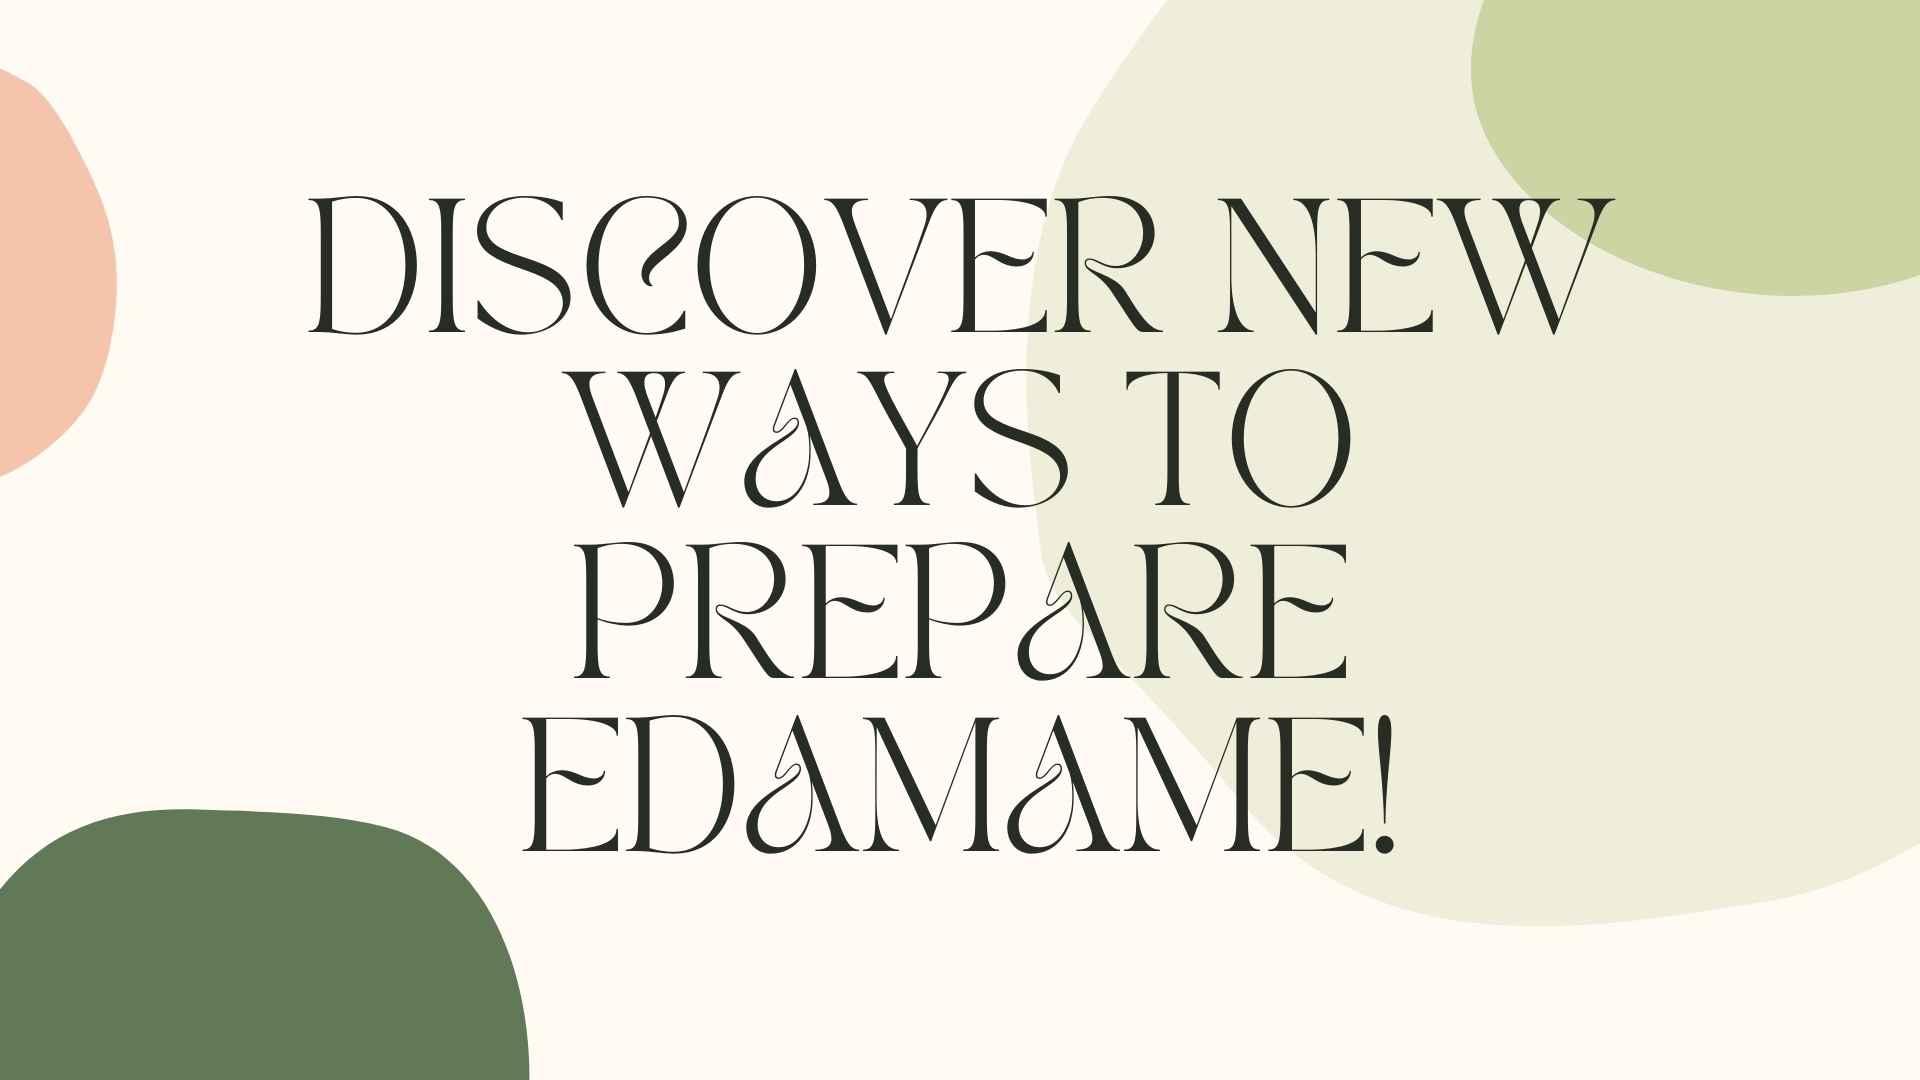 discover new ways to prepare edamame